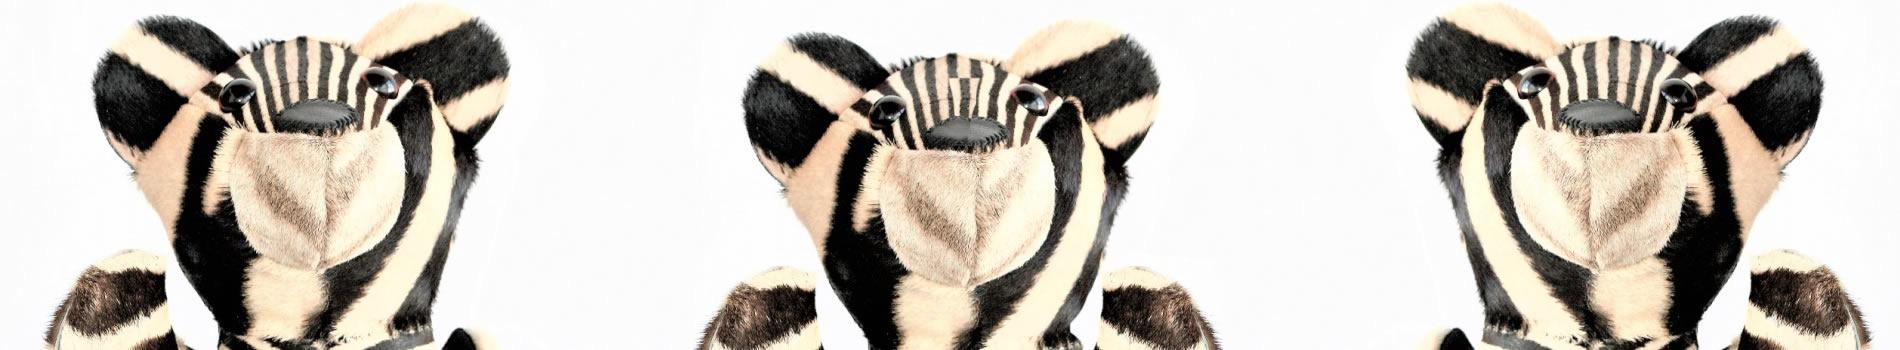 The Zebra teddy bear